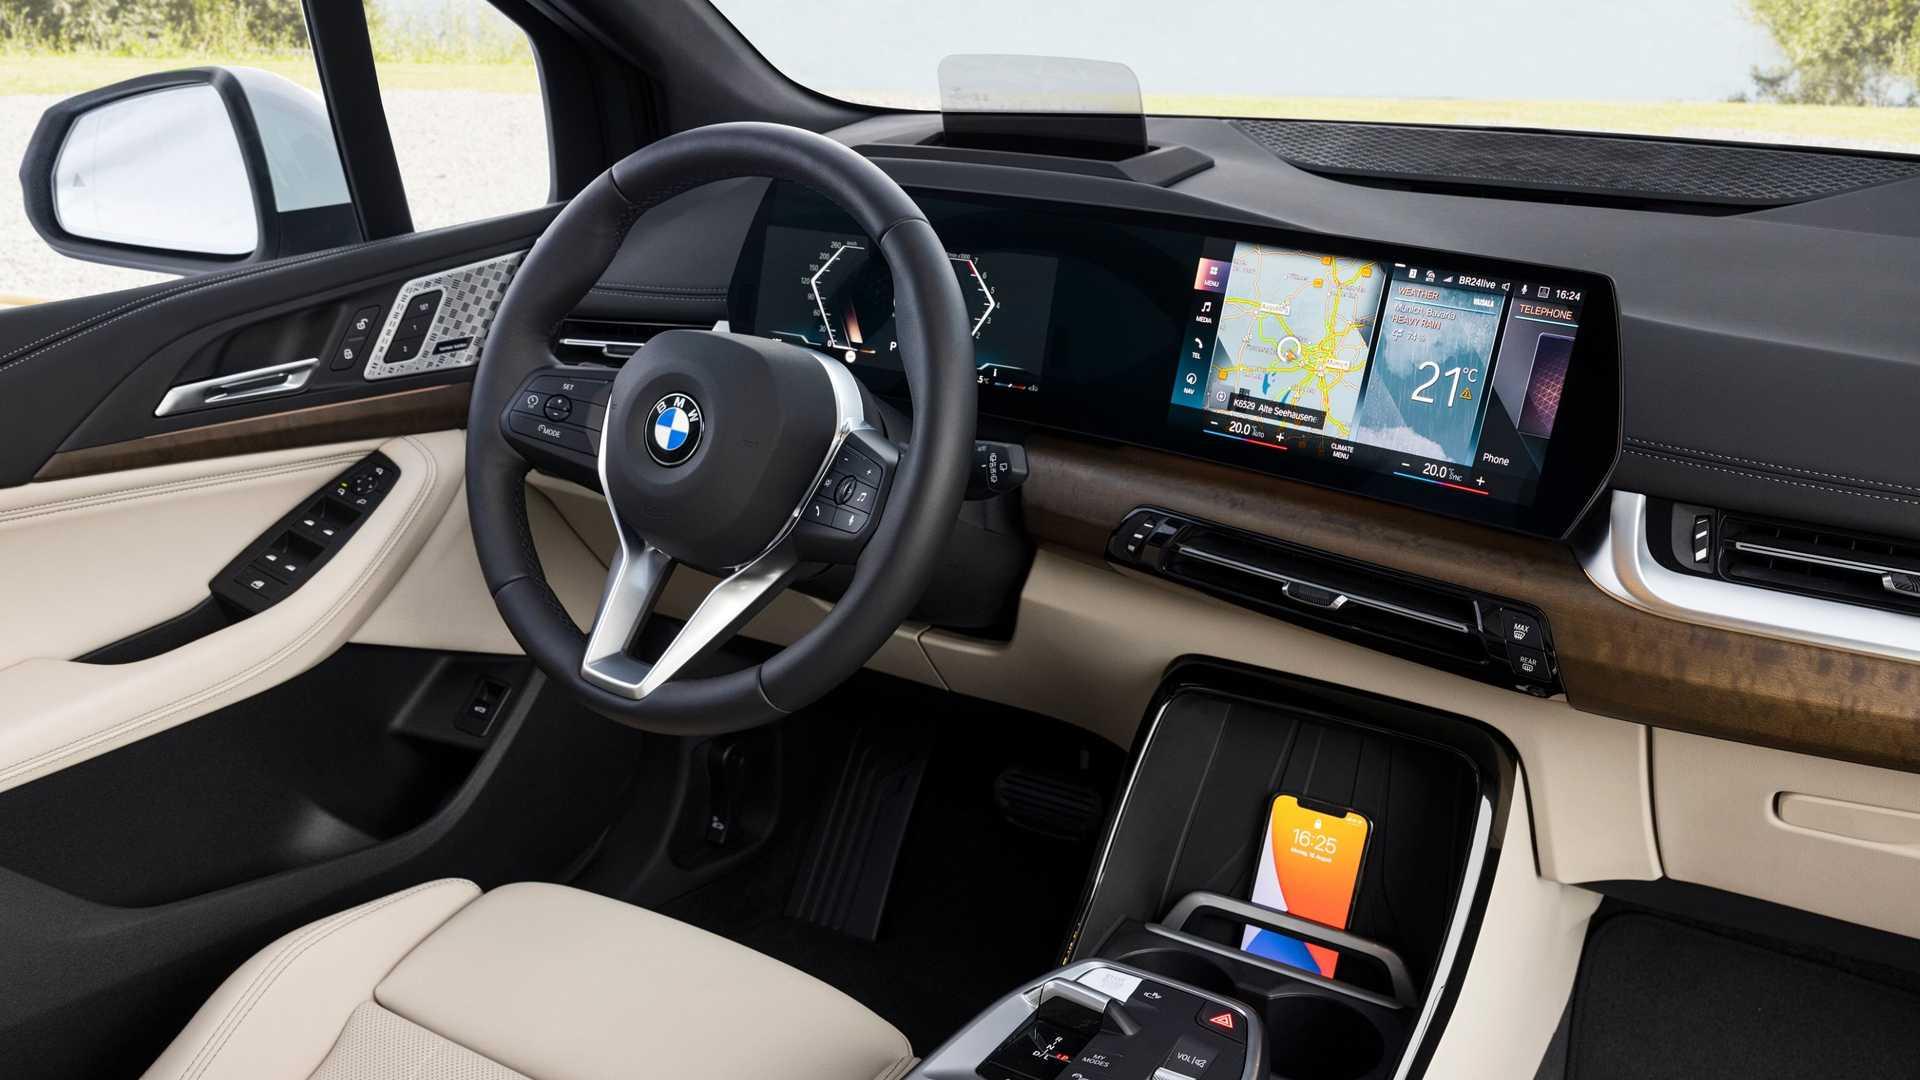 2-es szériás BMW Active Tourer utastere